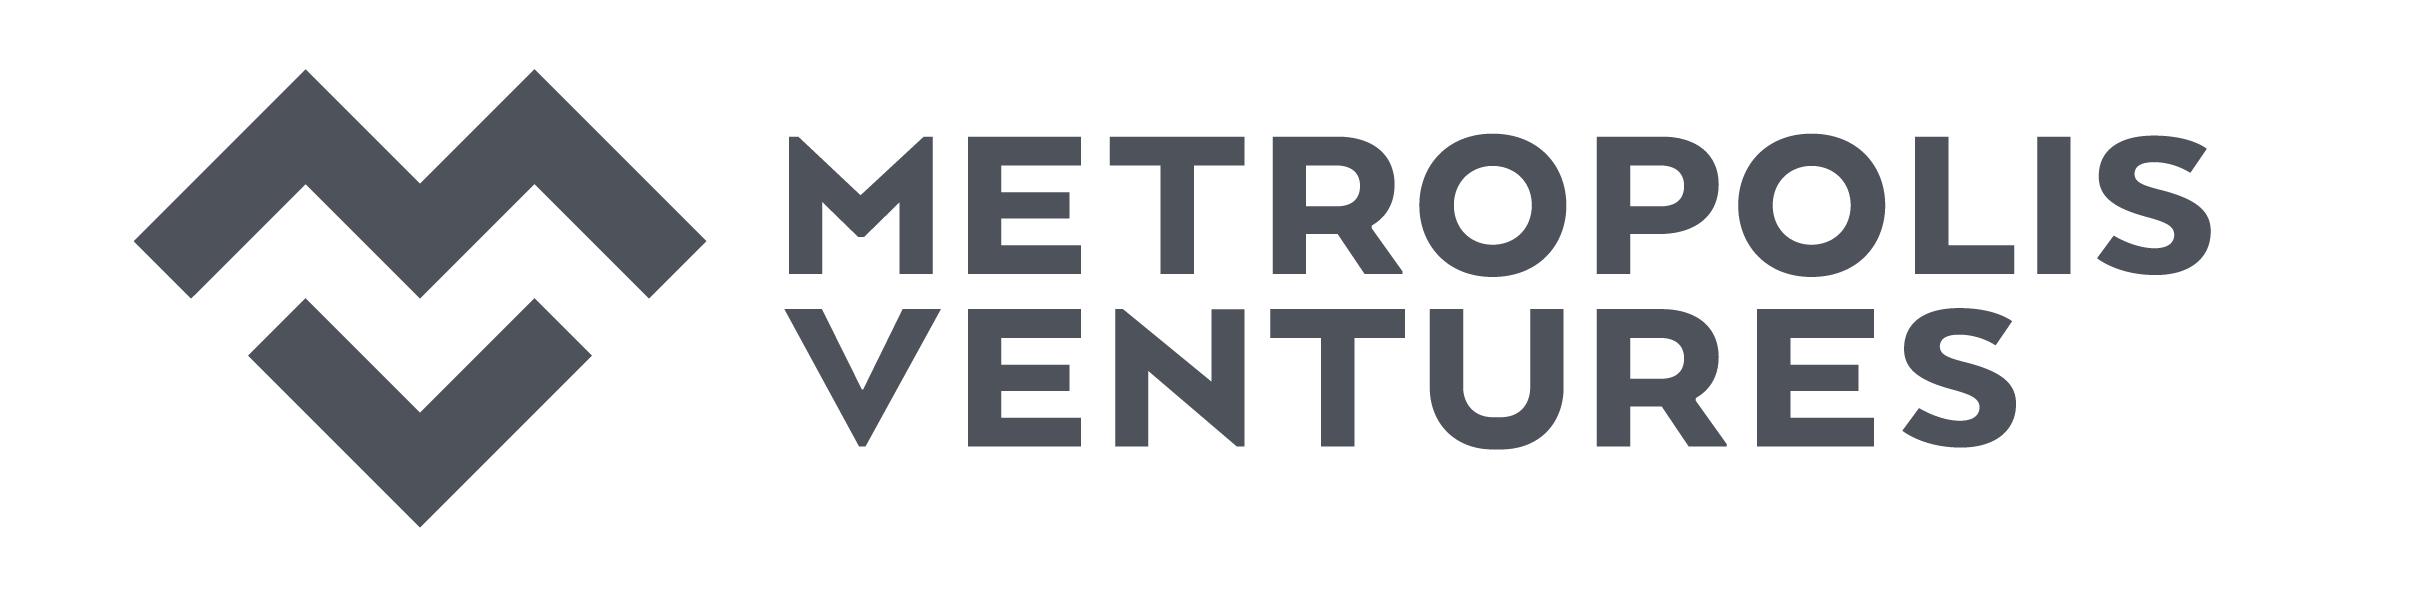 Metropolis_Ventures-01 (1).png